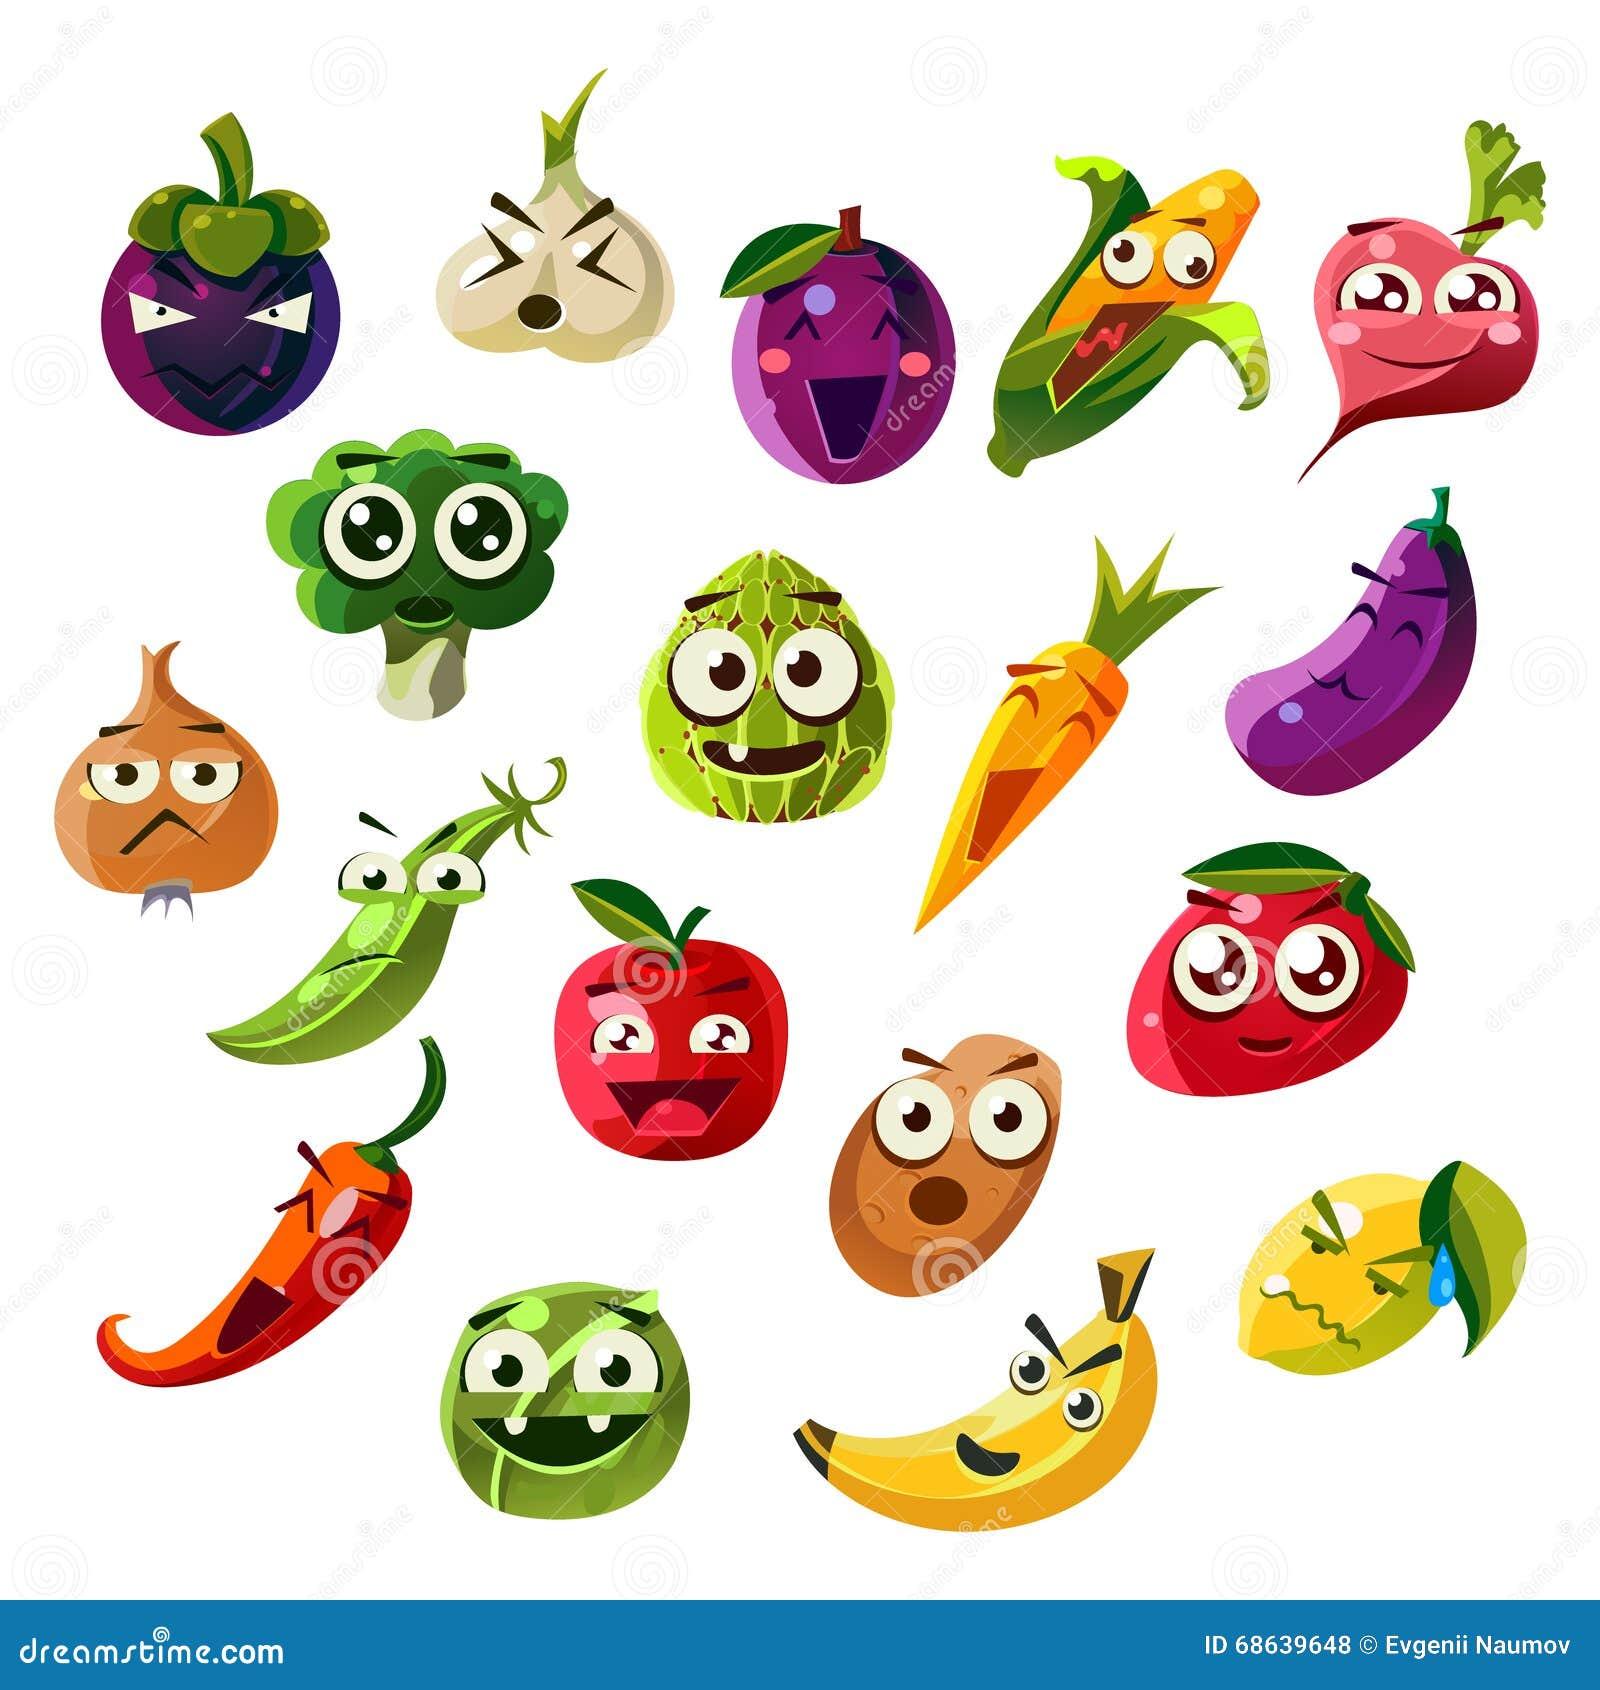 emoji sätze bilden